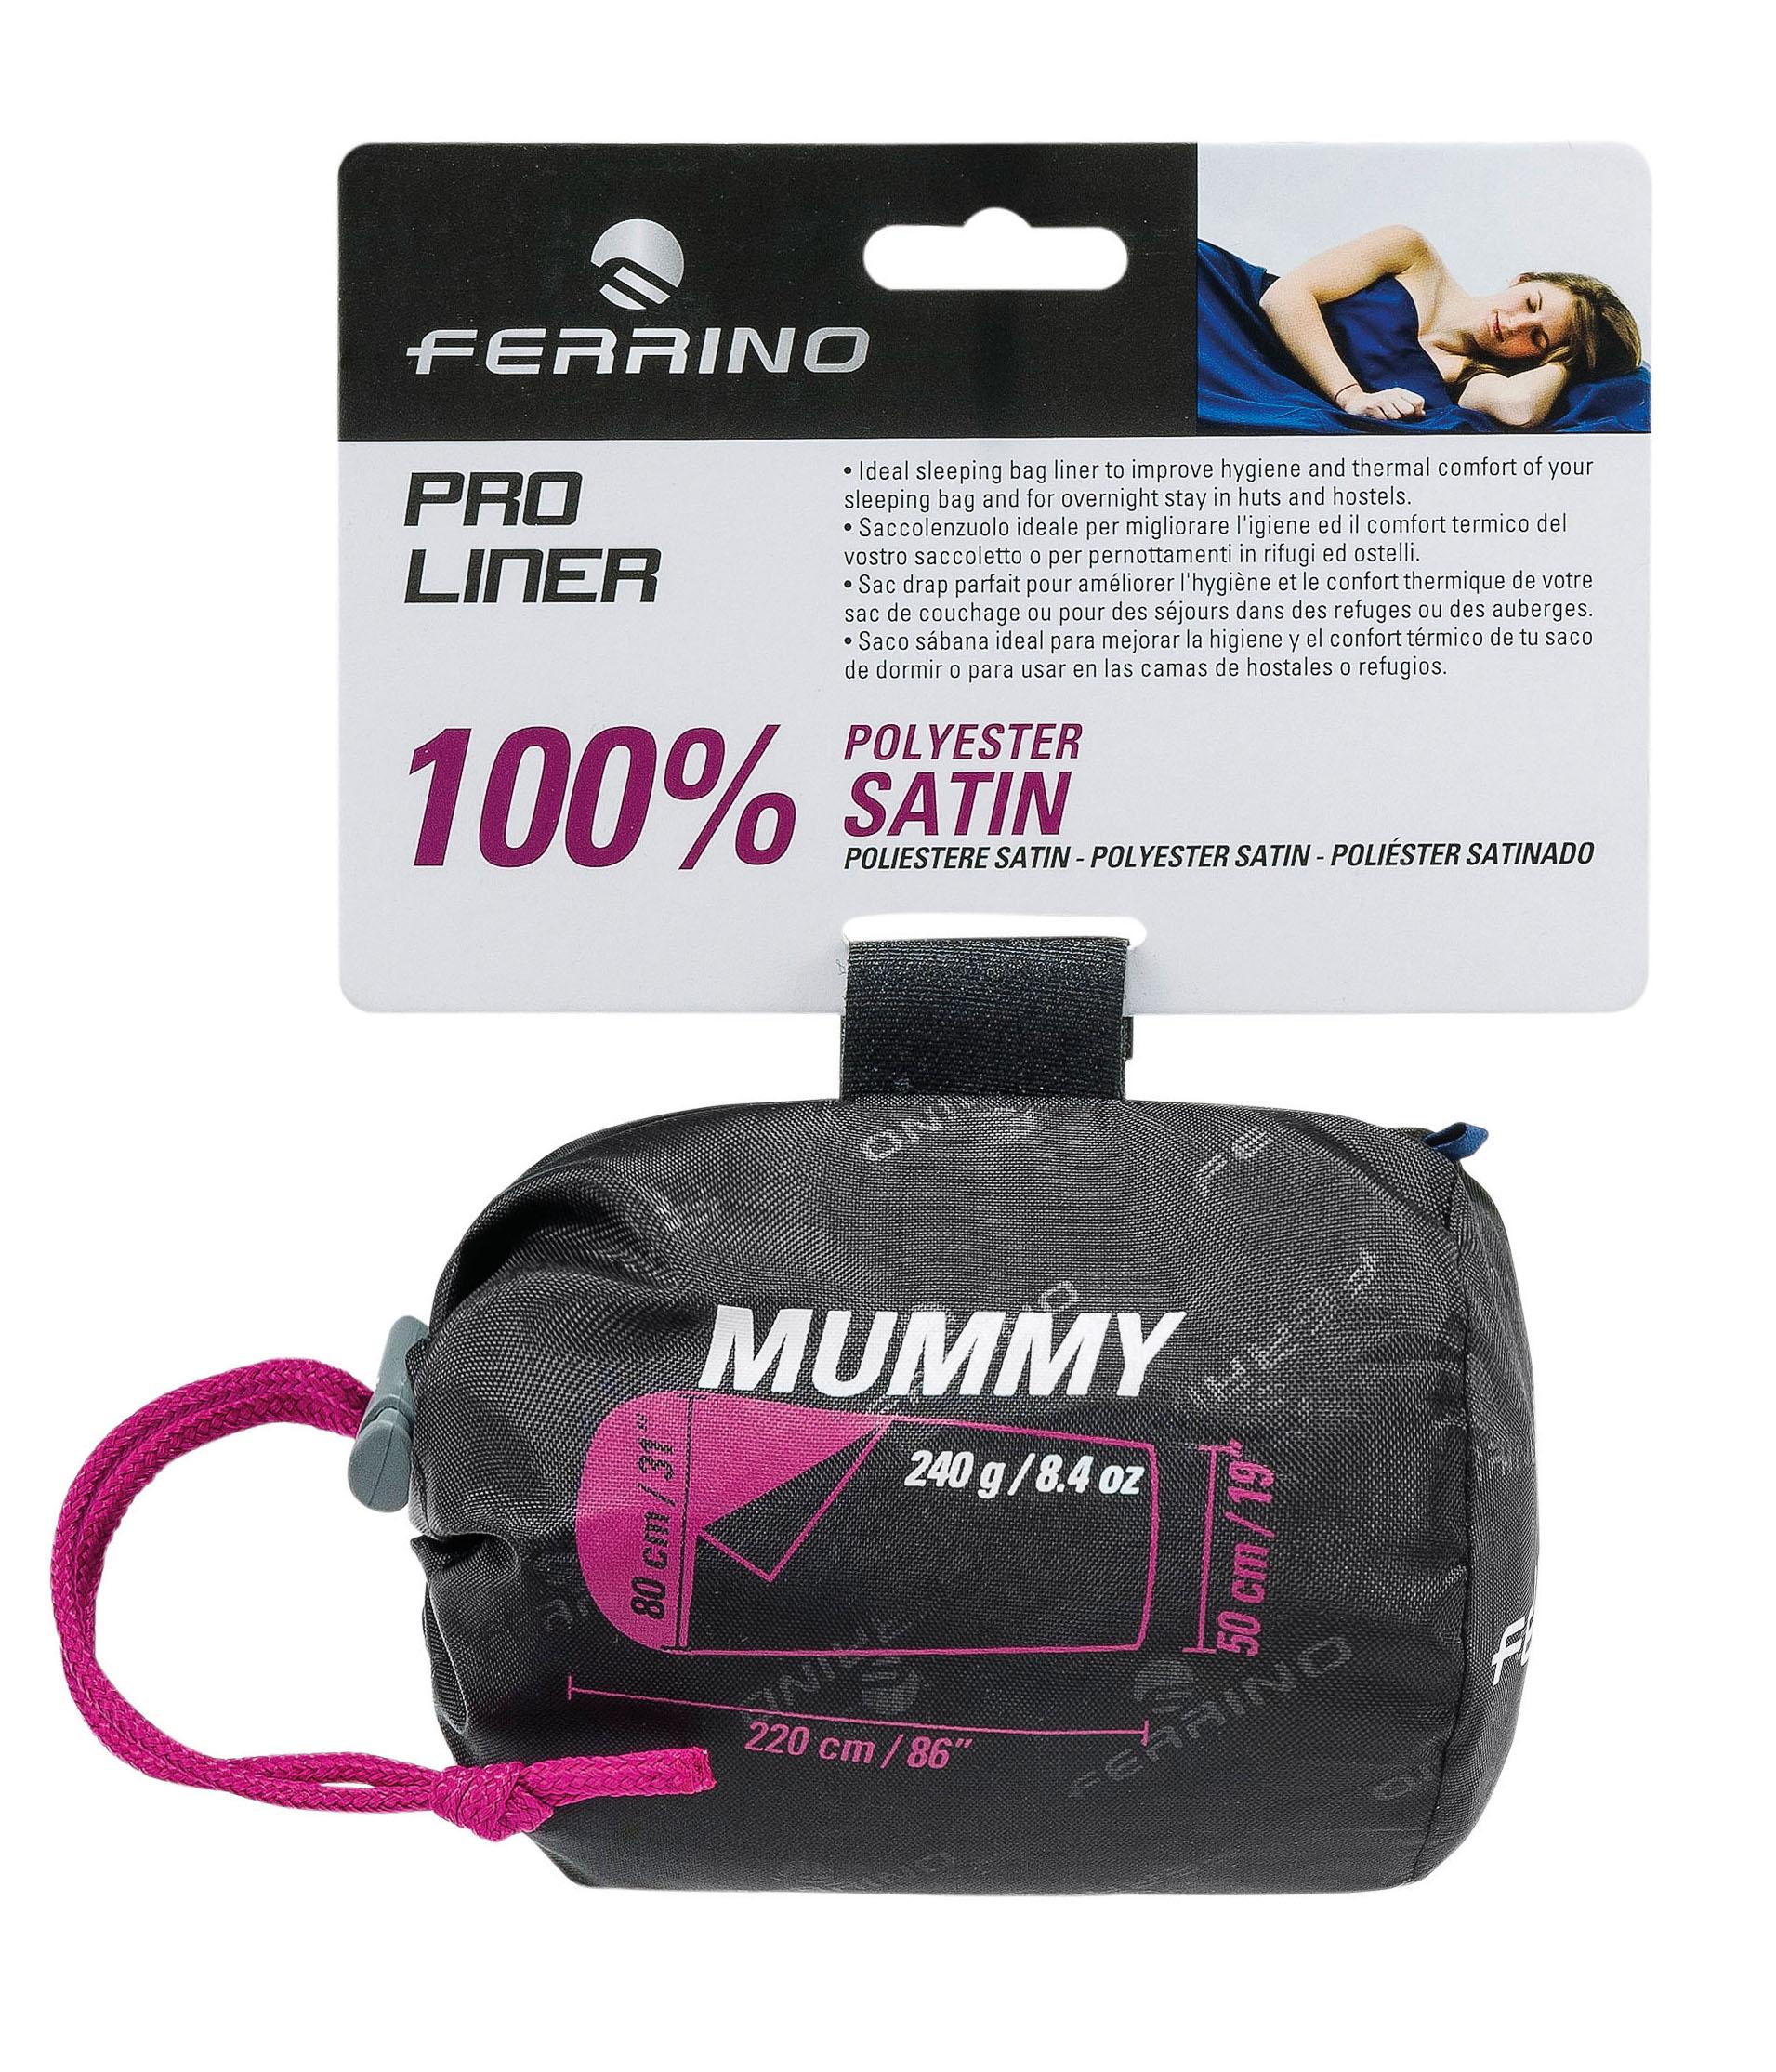 Ferrino Pro Liner Mummy - Drap de sac de couchage